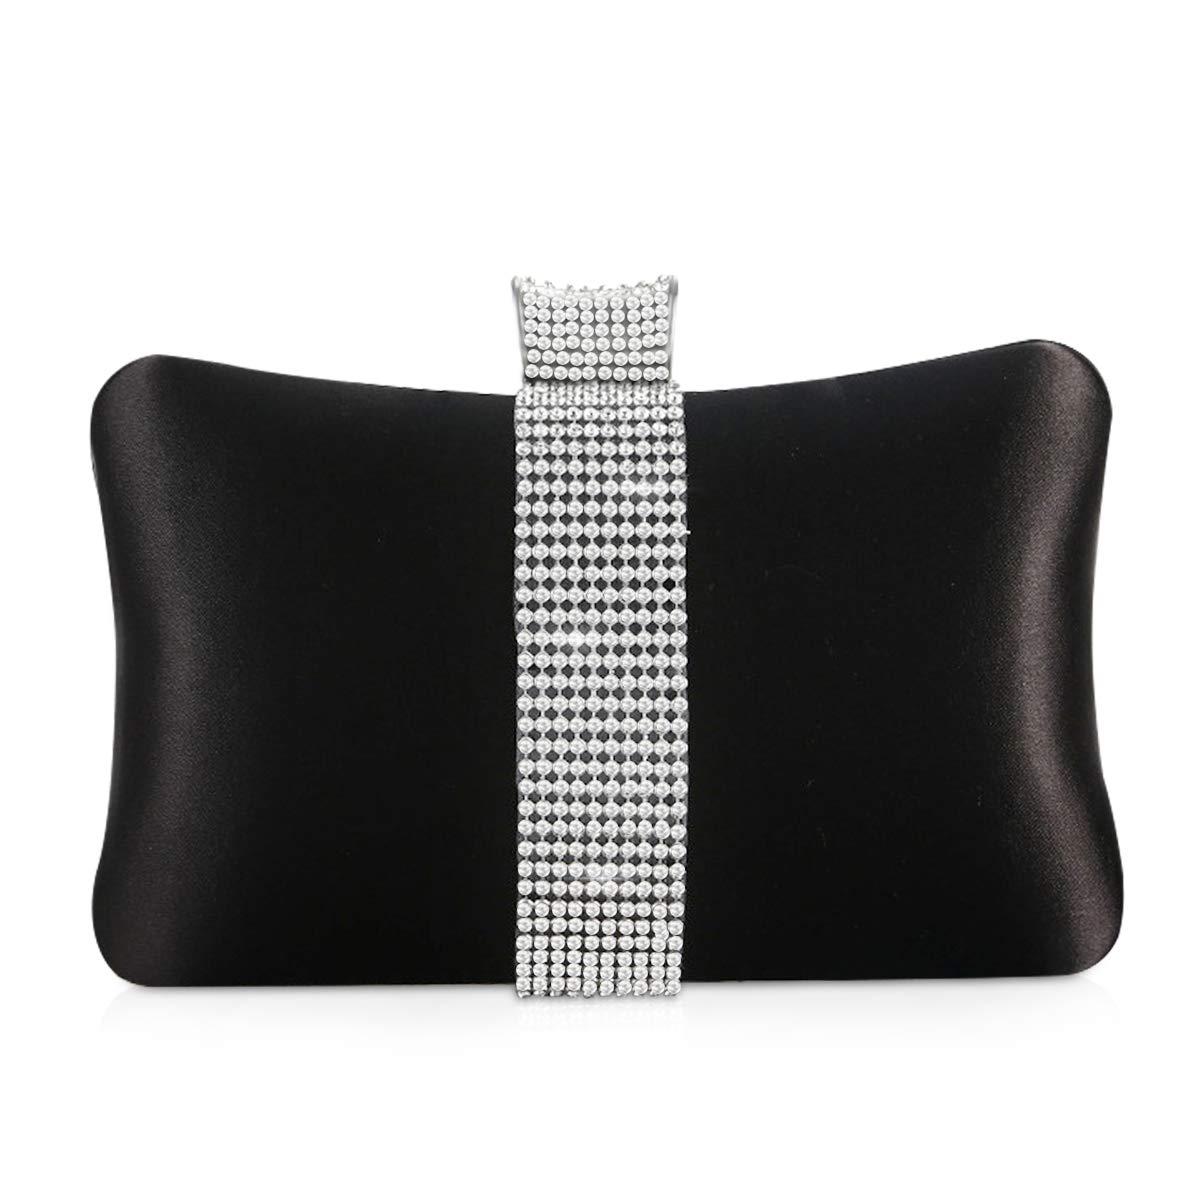 NICOLE & DORIS damhandväskor diamant silkeslen kuvertväska liten handväska bröllopsfest aftonväska Svart